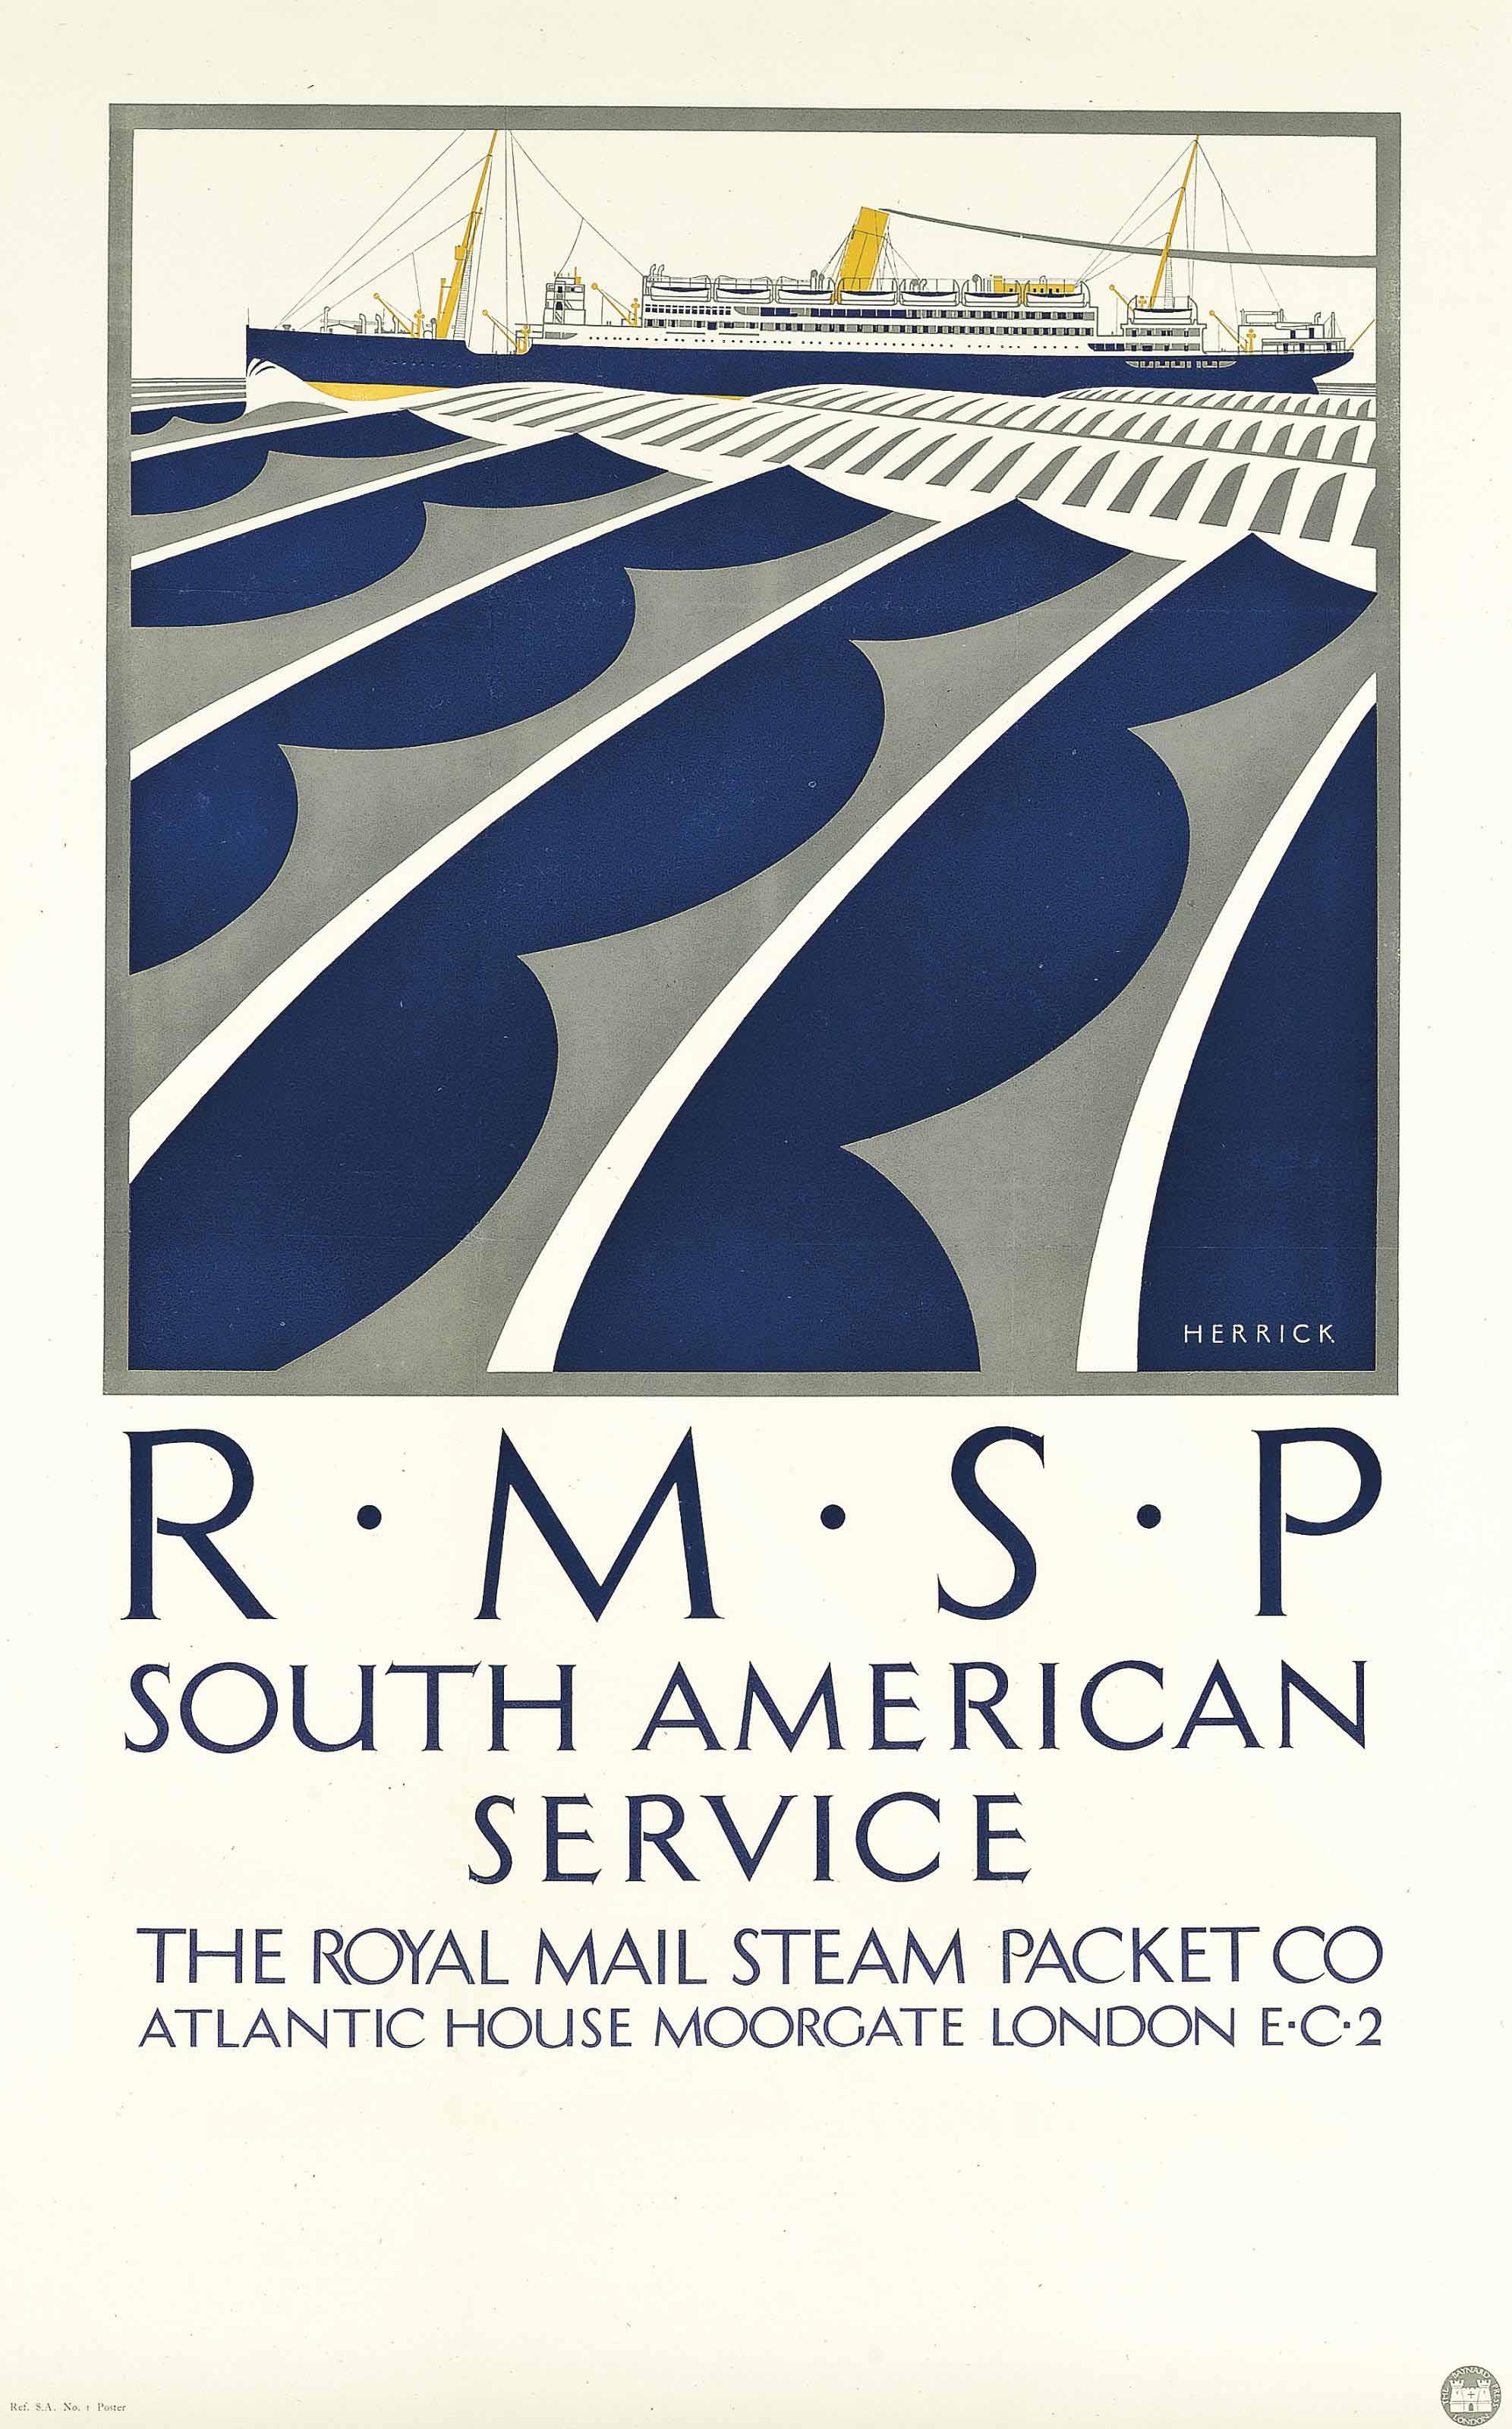 R.M.S.P SOUTH AMERICAN SERVICE